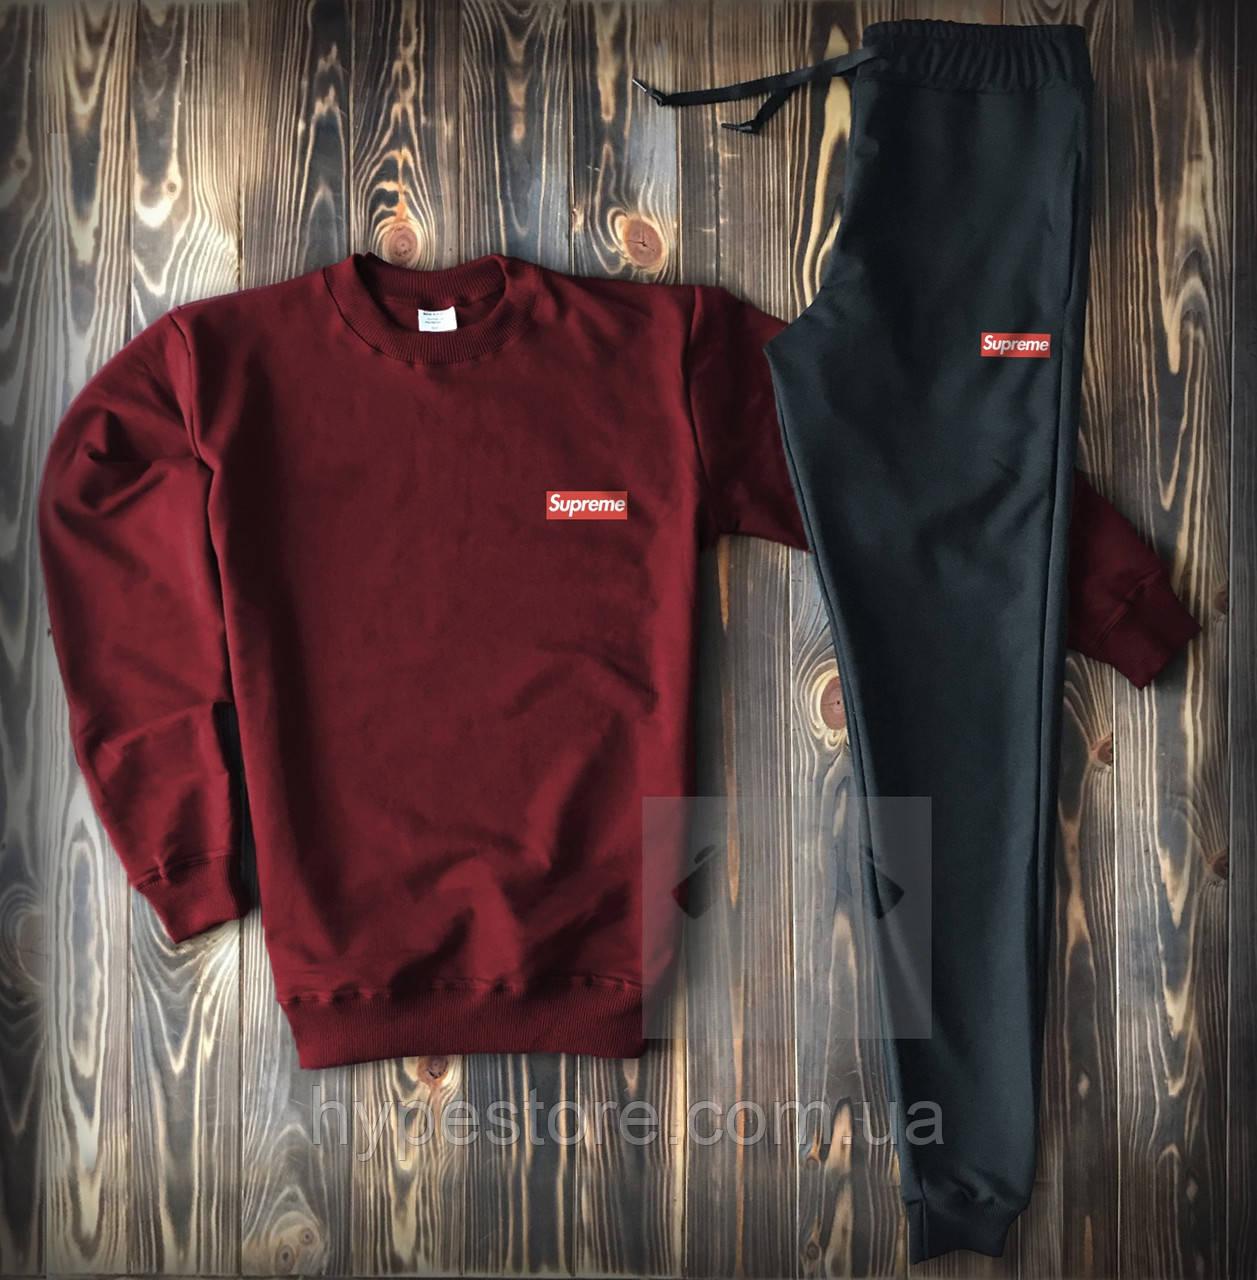 Мужской весенний спортивный костюм, чоловічий костюм Supreme, суприм (бордо+черный), Реплика